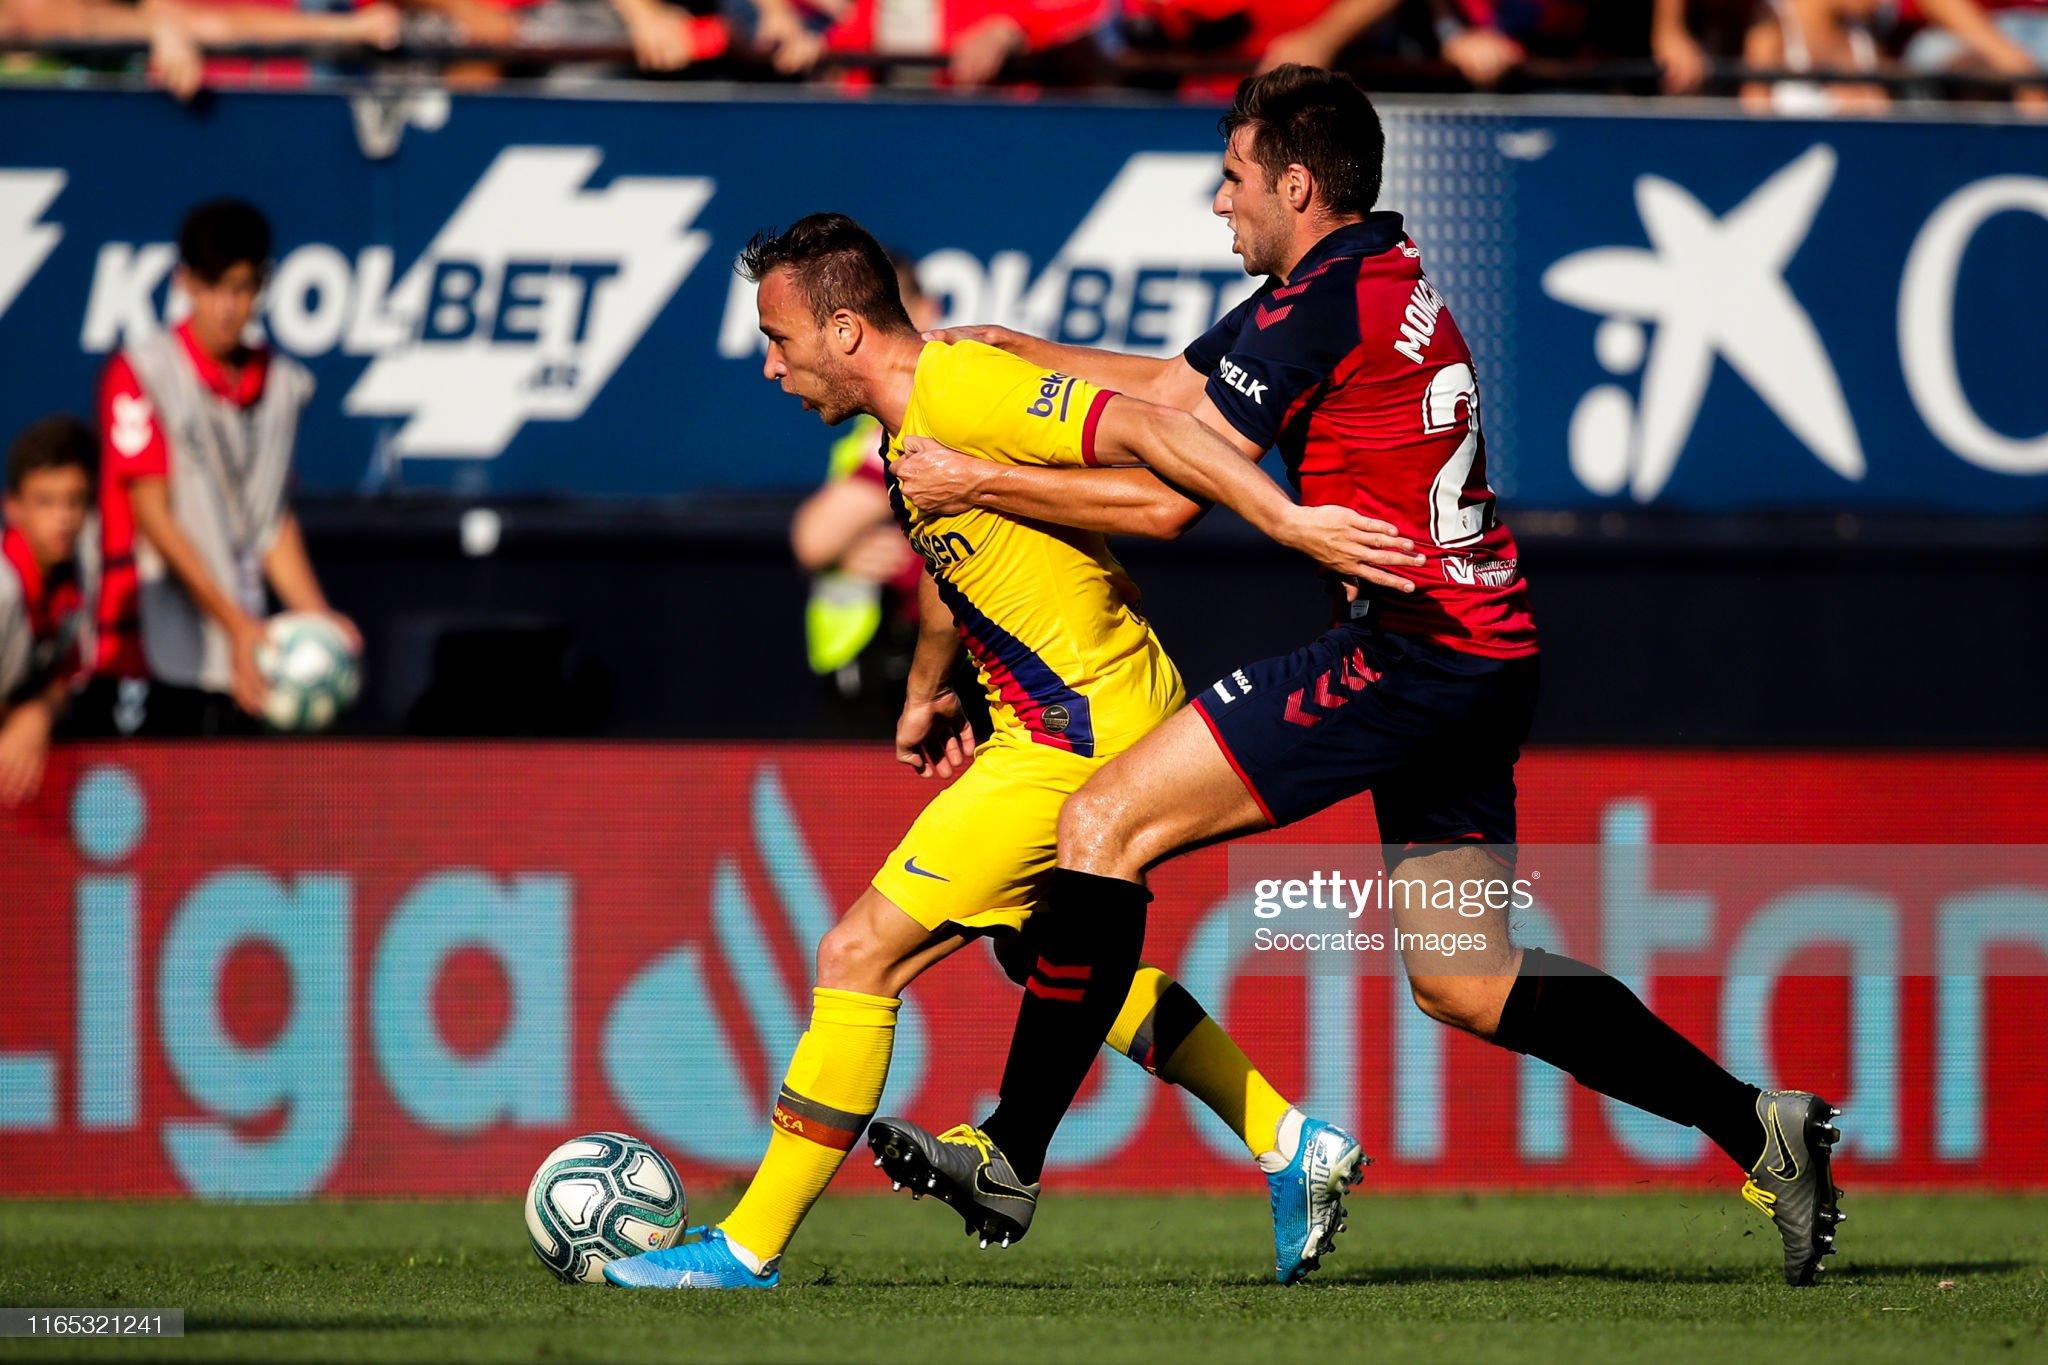 صور مباراة : أوساسونا - برشلونة 2-2 ( 31-08-2019 )  Arthur-of-fc-barcelona-nacho-vidal-of-ca-osasuna-during-the-la-liga-picture-id1165321241?s=2048x2048